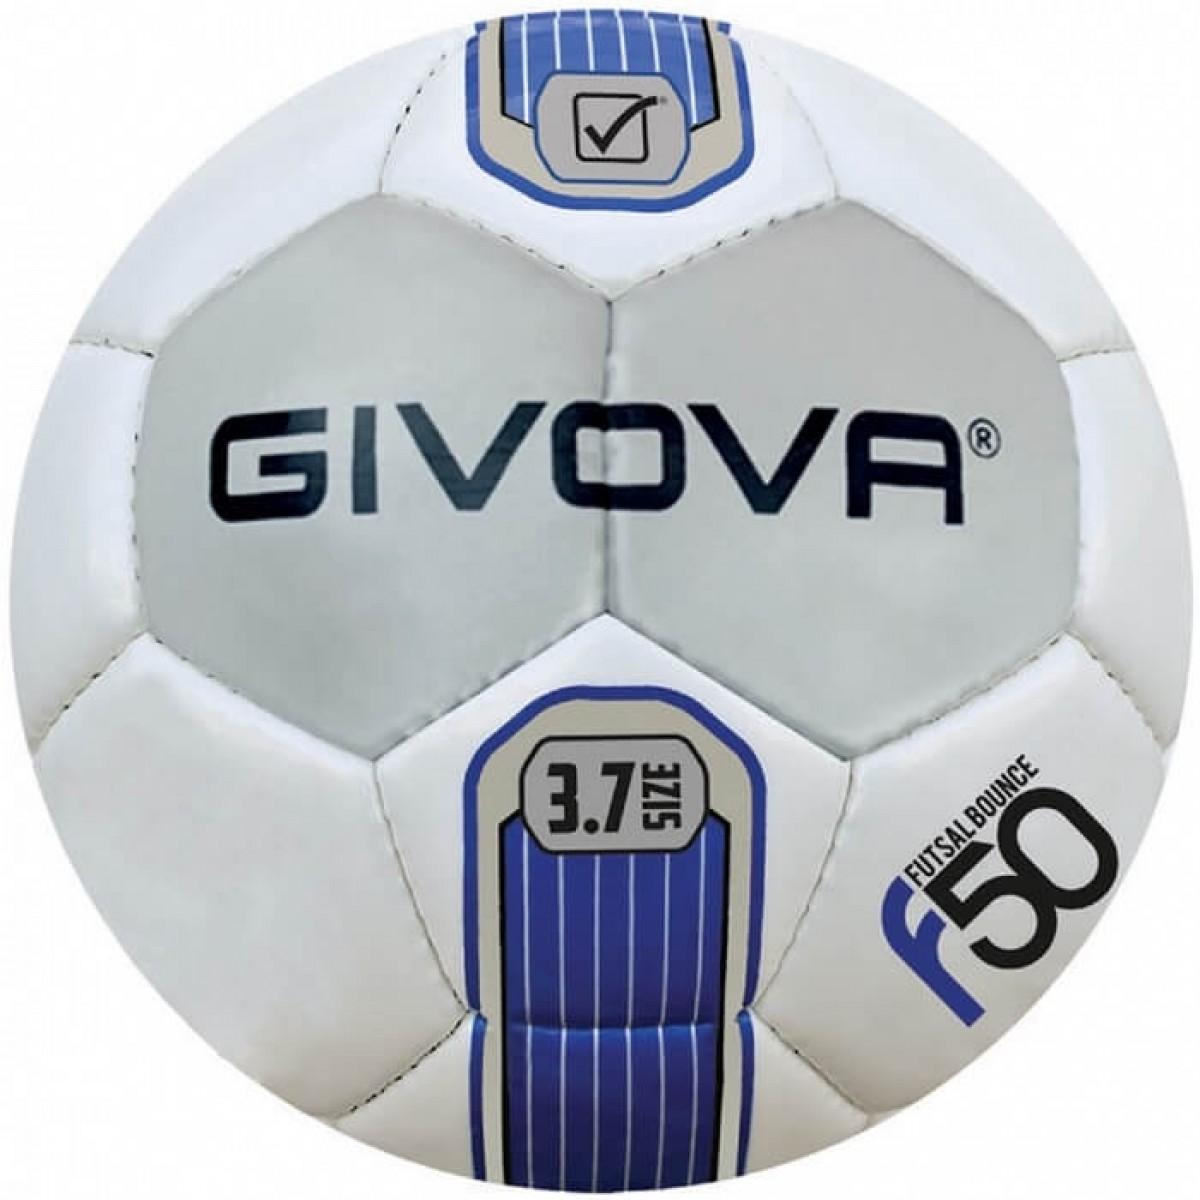 Givova Bounce F50 futsal